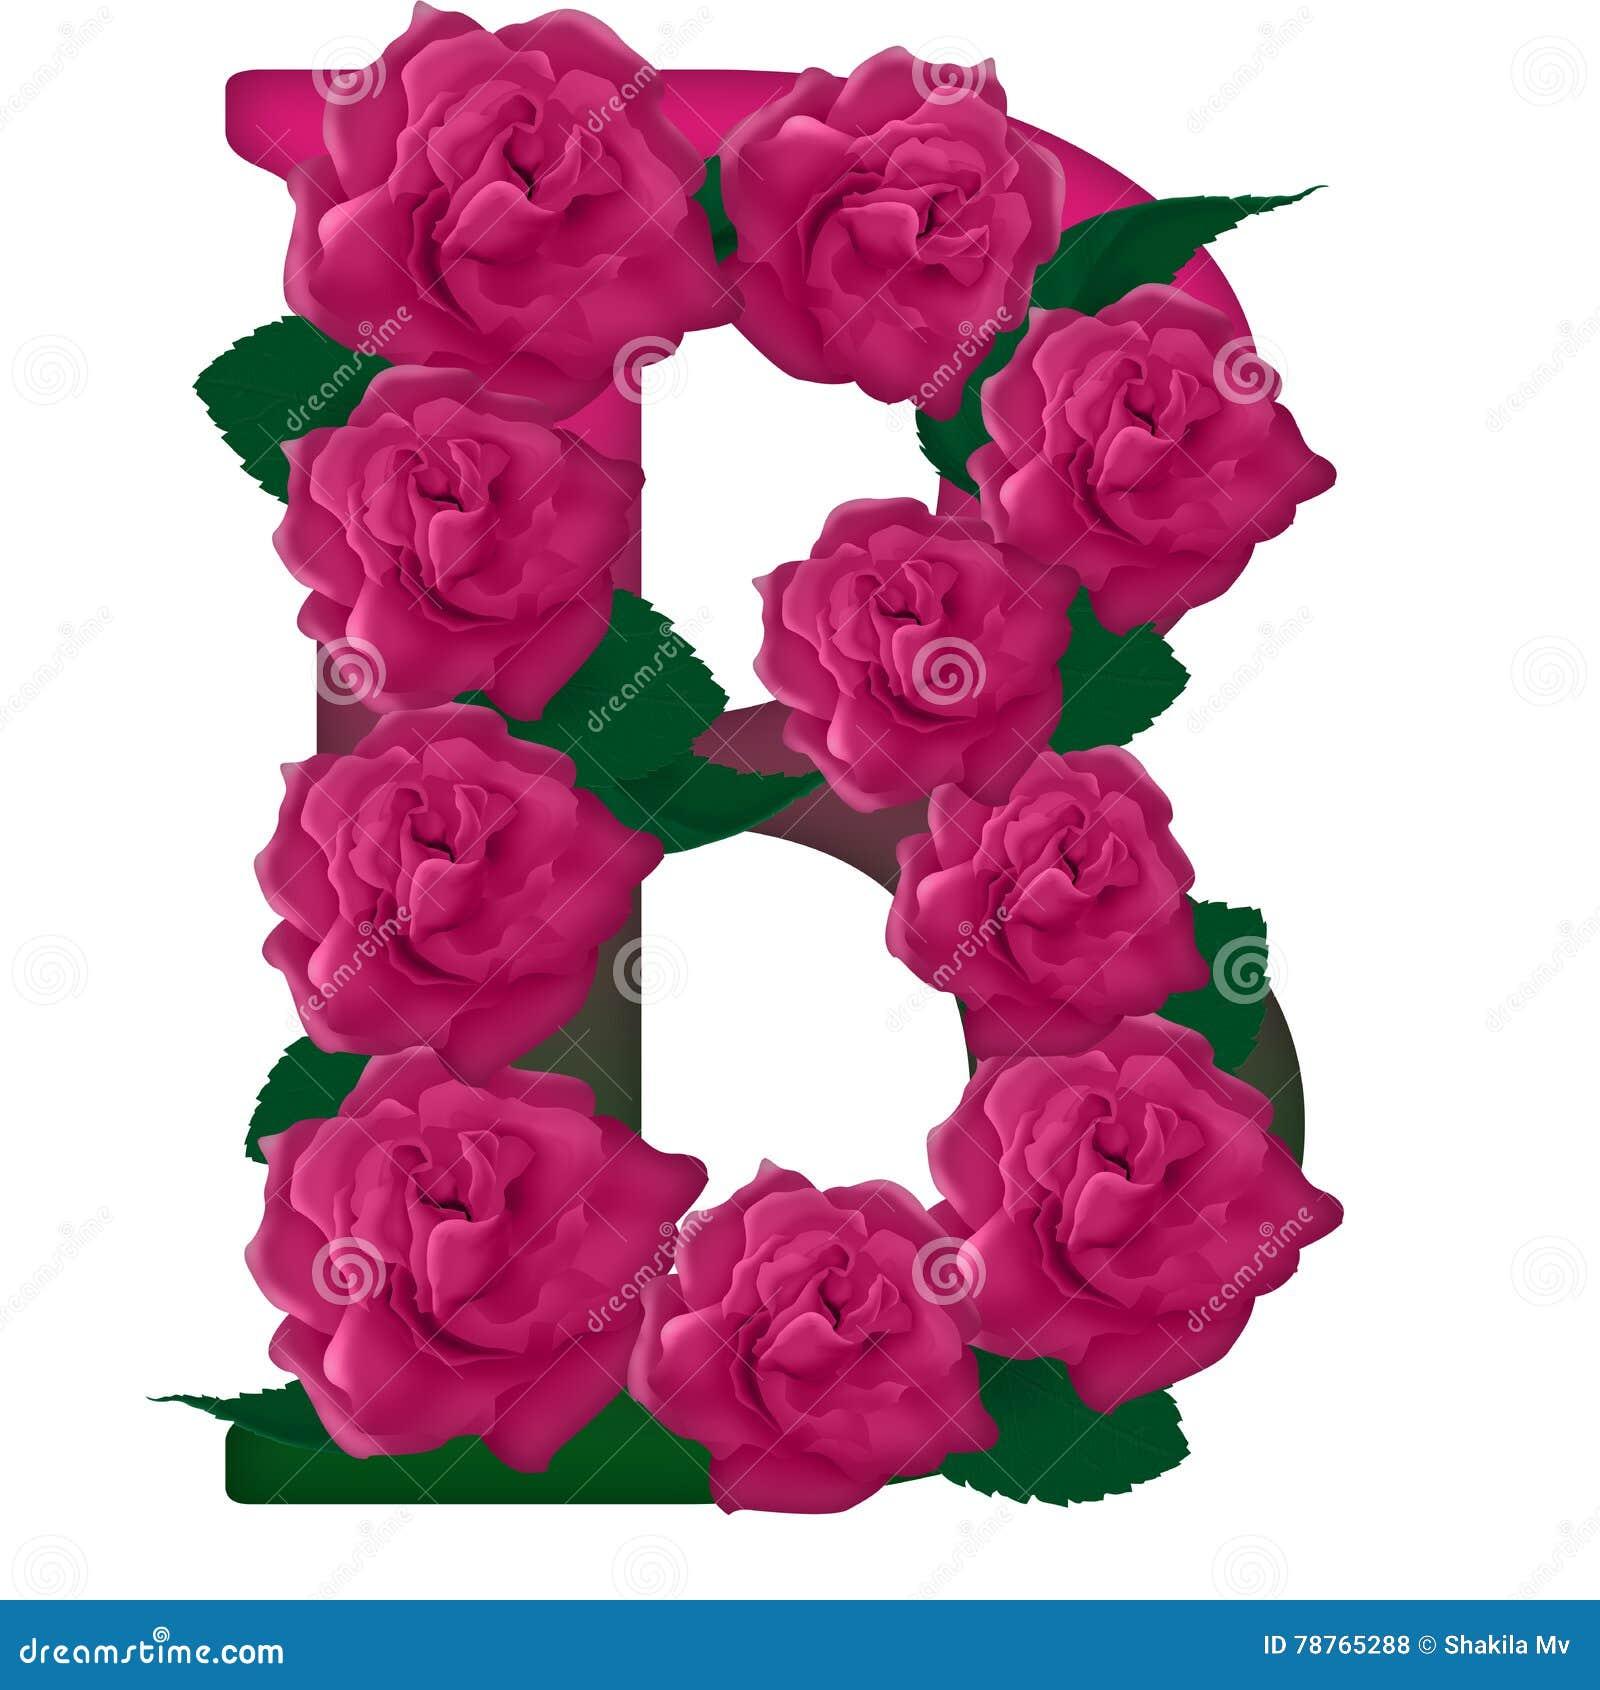 Letter B Flower Illustration Stock Photo - Illustration of colored ...